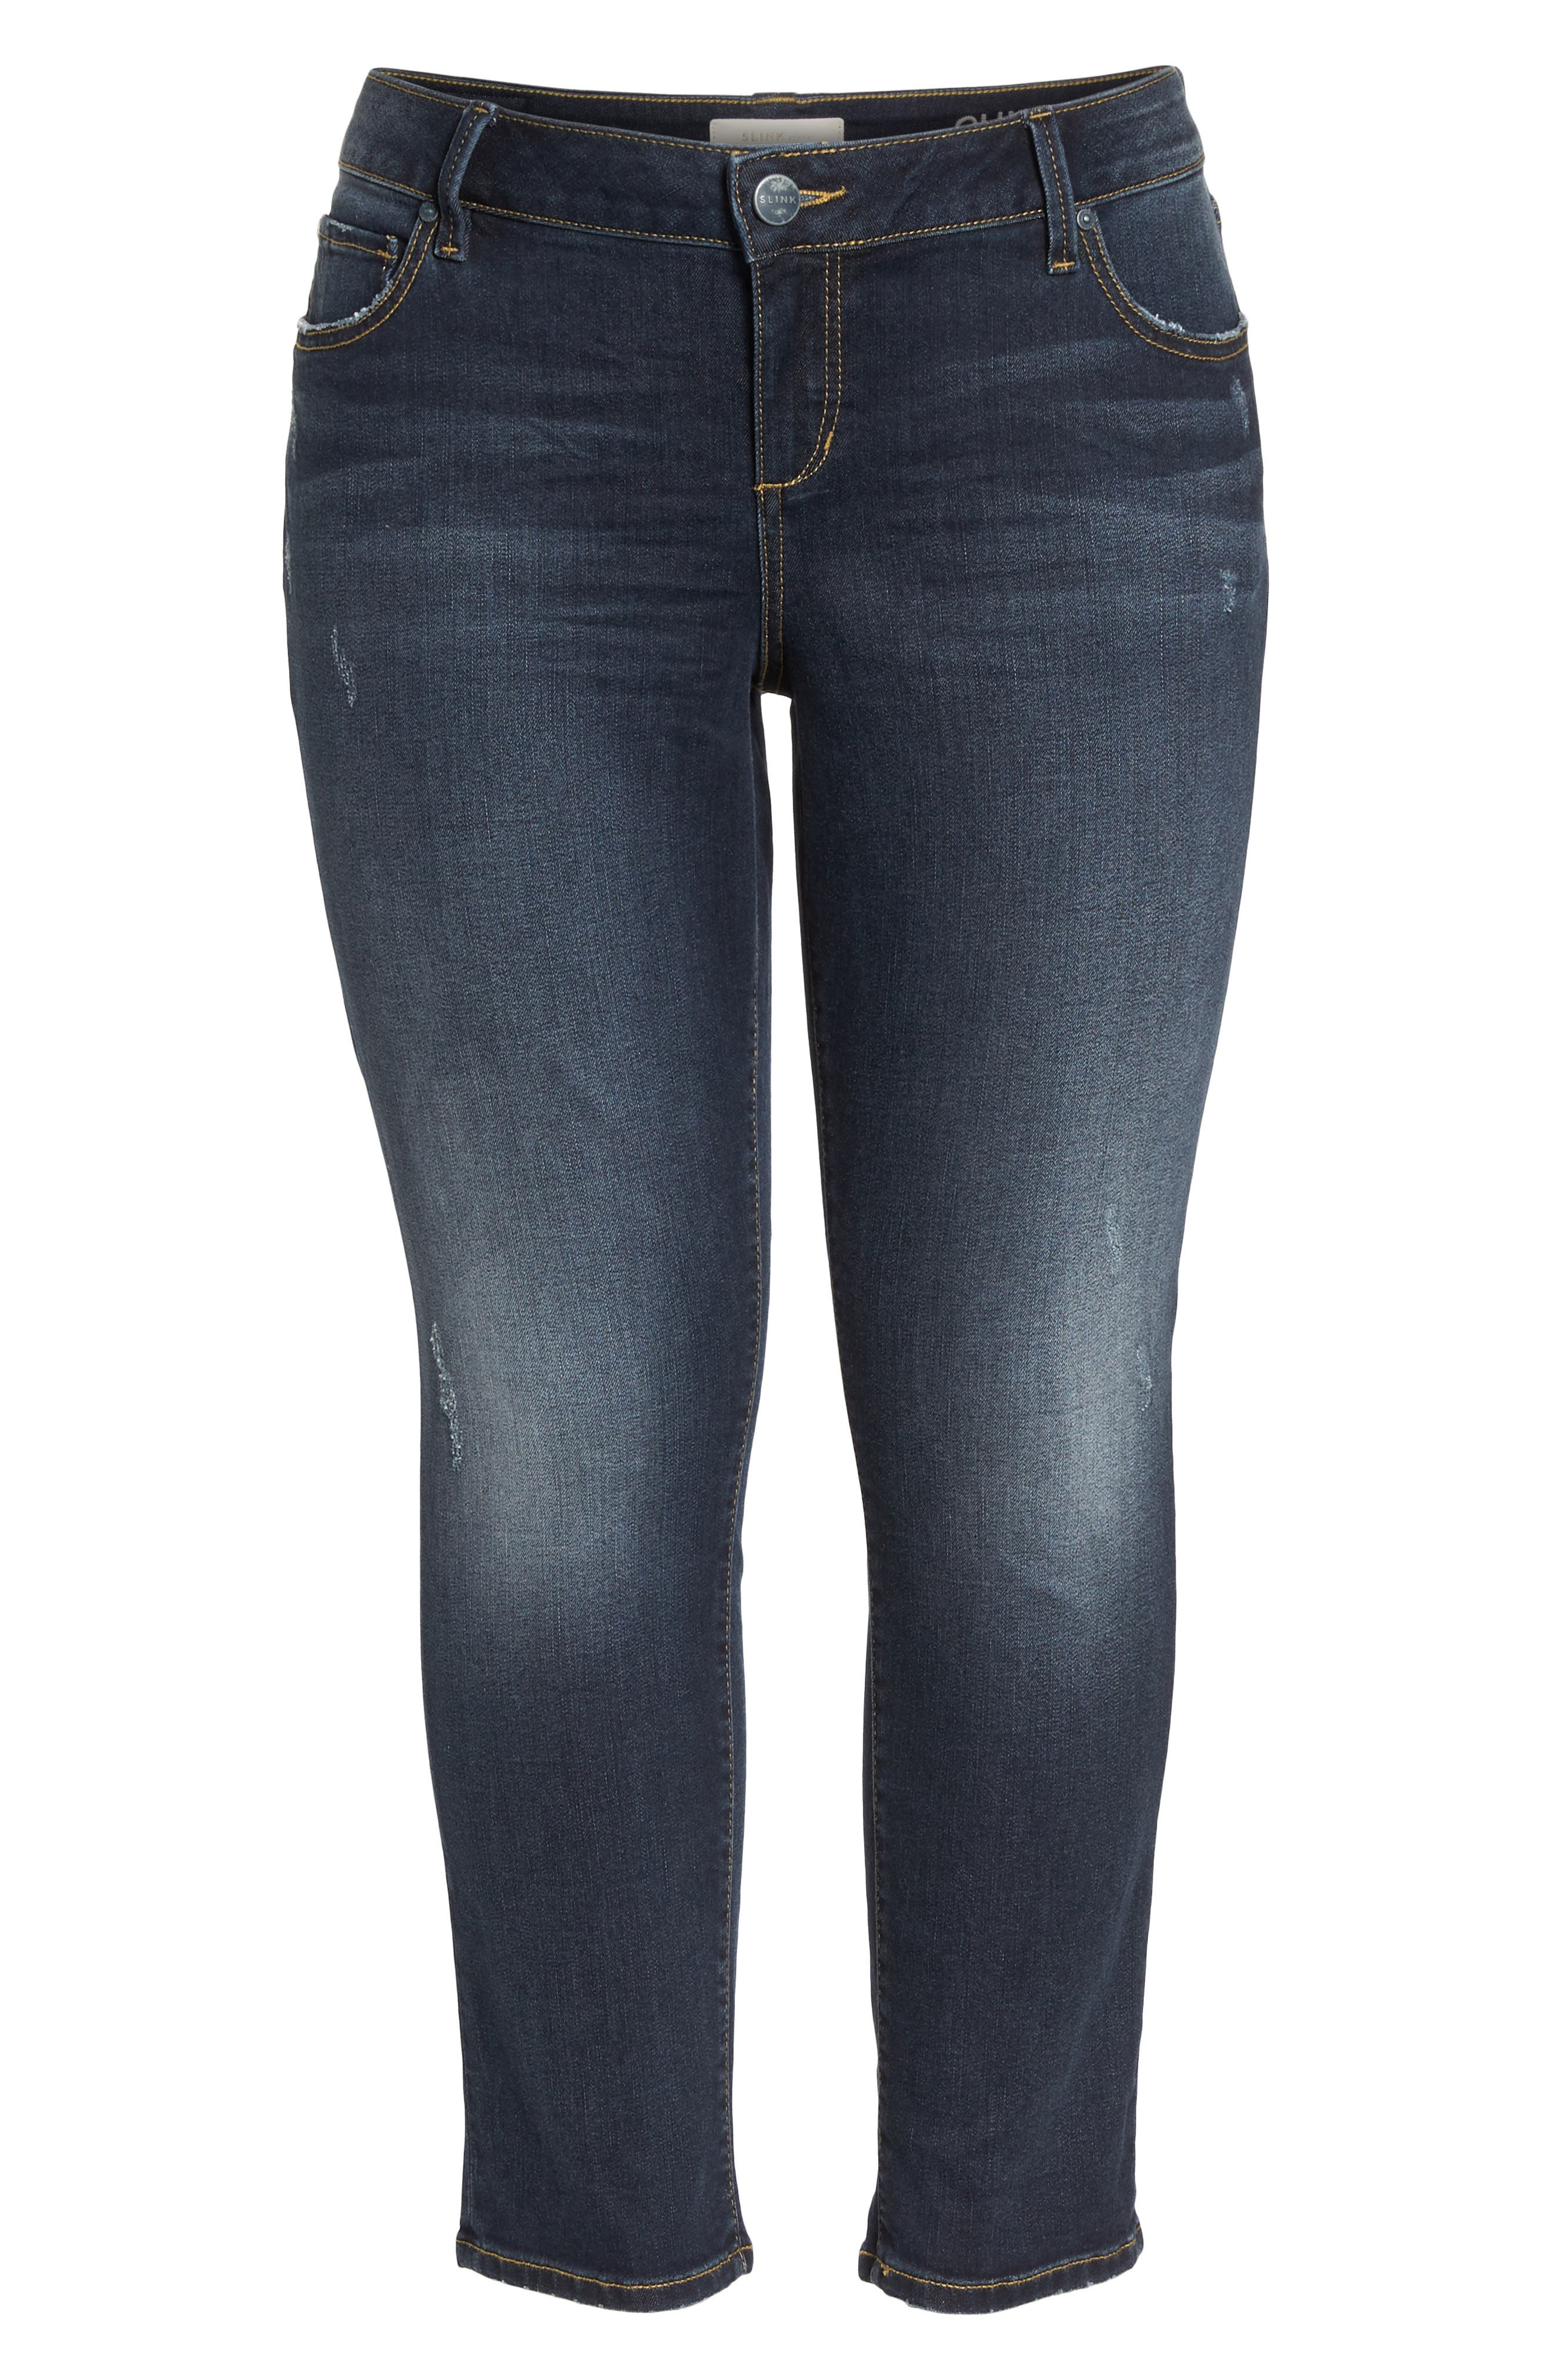 SLINK JEANS, Stretch Ankle Boyfriend Jeans, Alternate thumbnail 7, color, BELLA